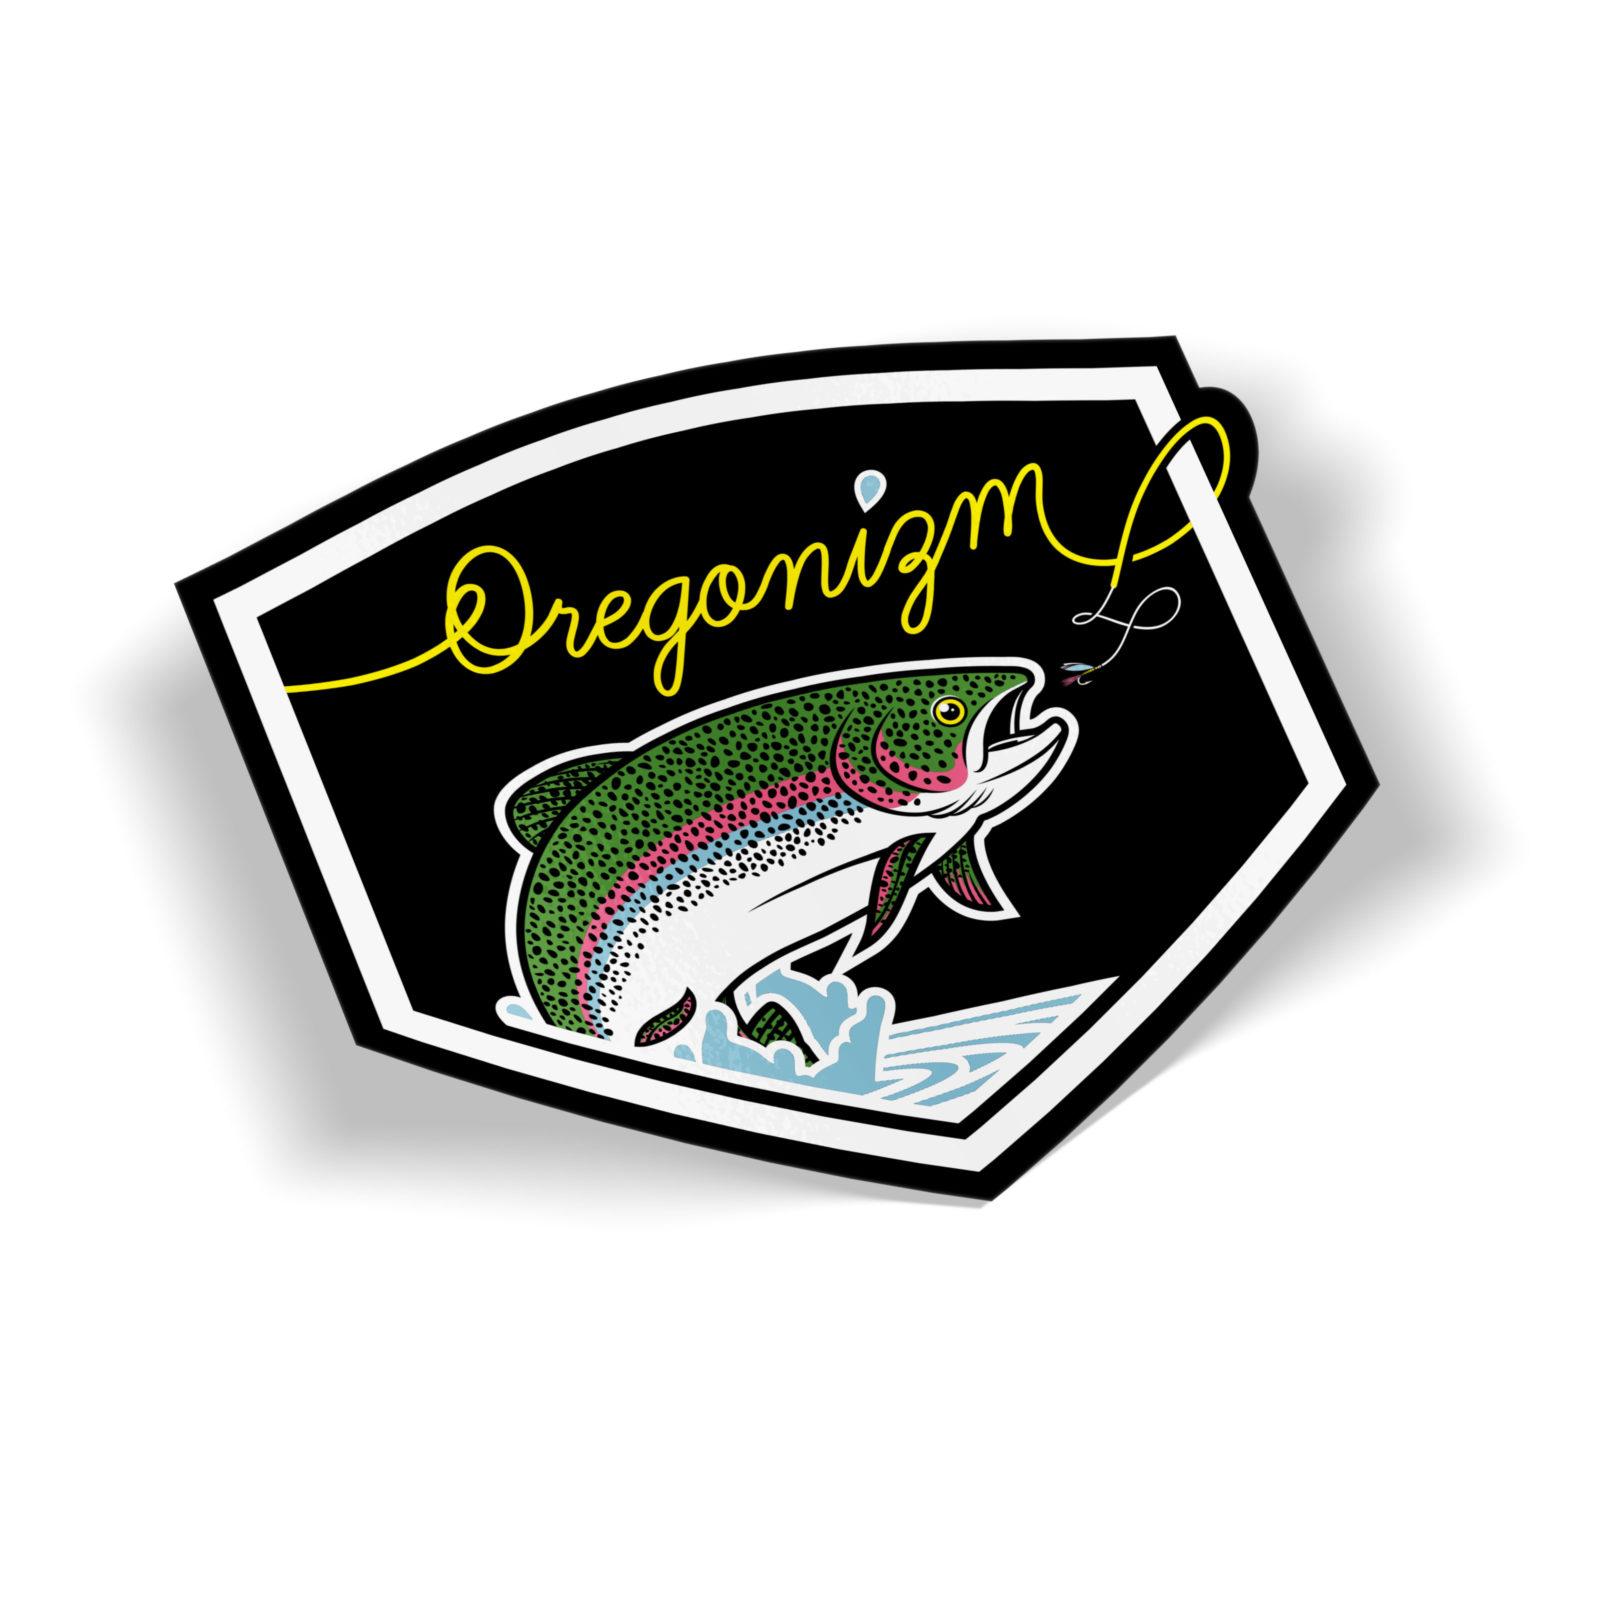 oregonizm-product-sticker-troutizm-4inch